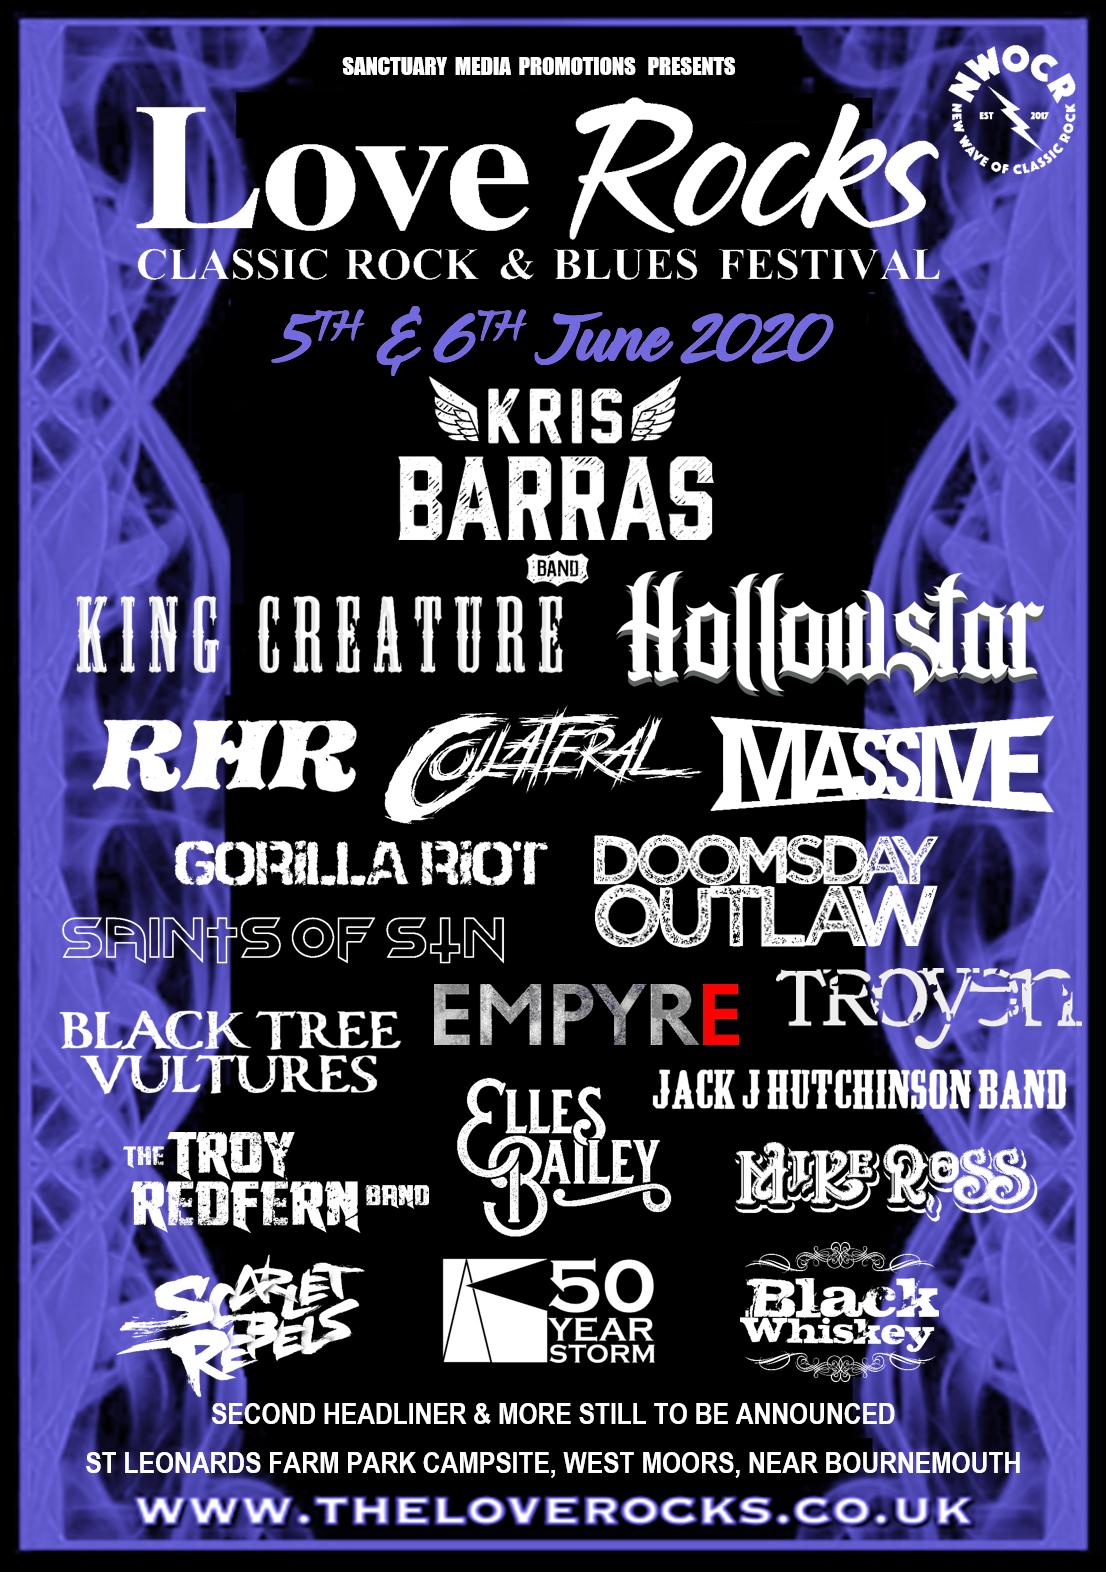 Loverocks 2020 Classic Rock Festival, Bournemouth, Dorset